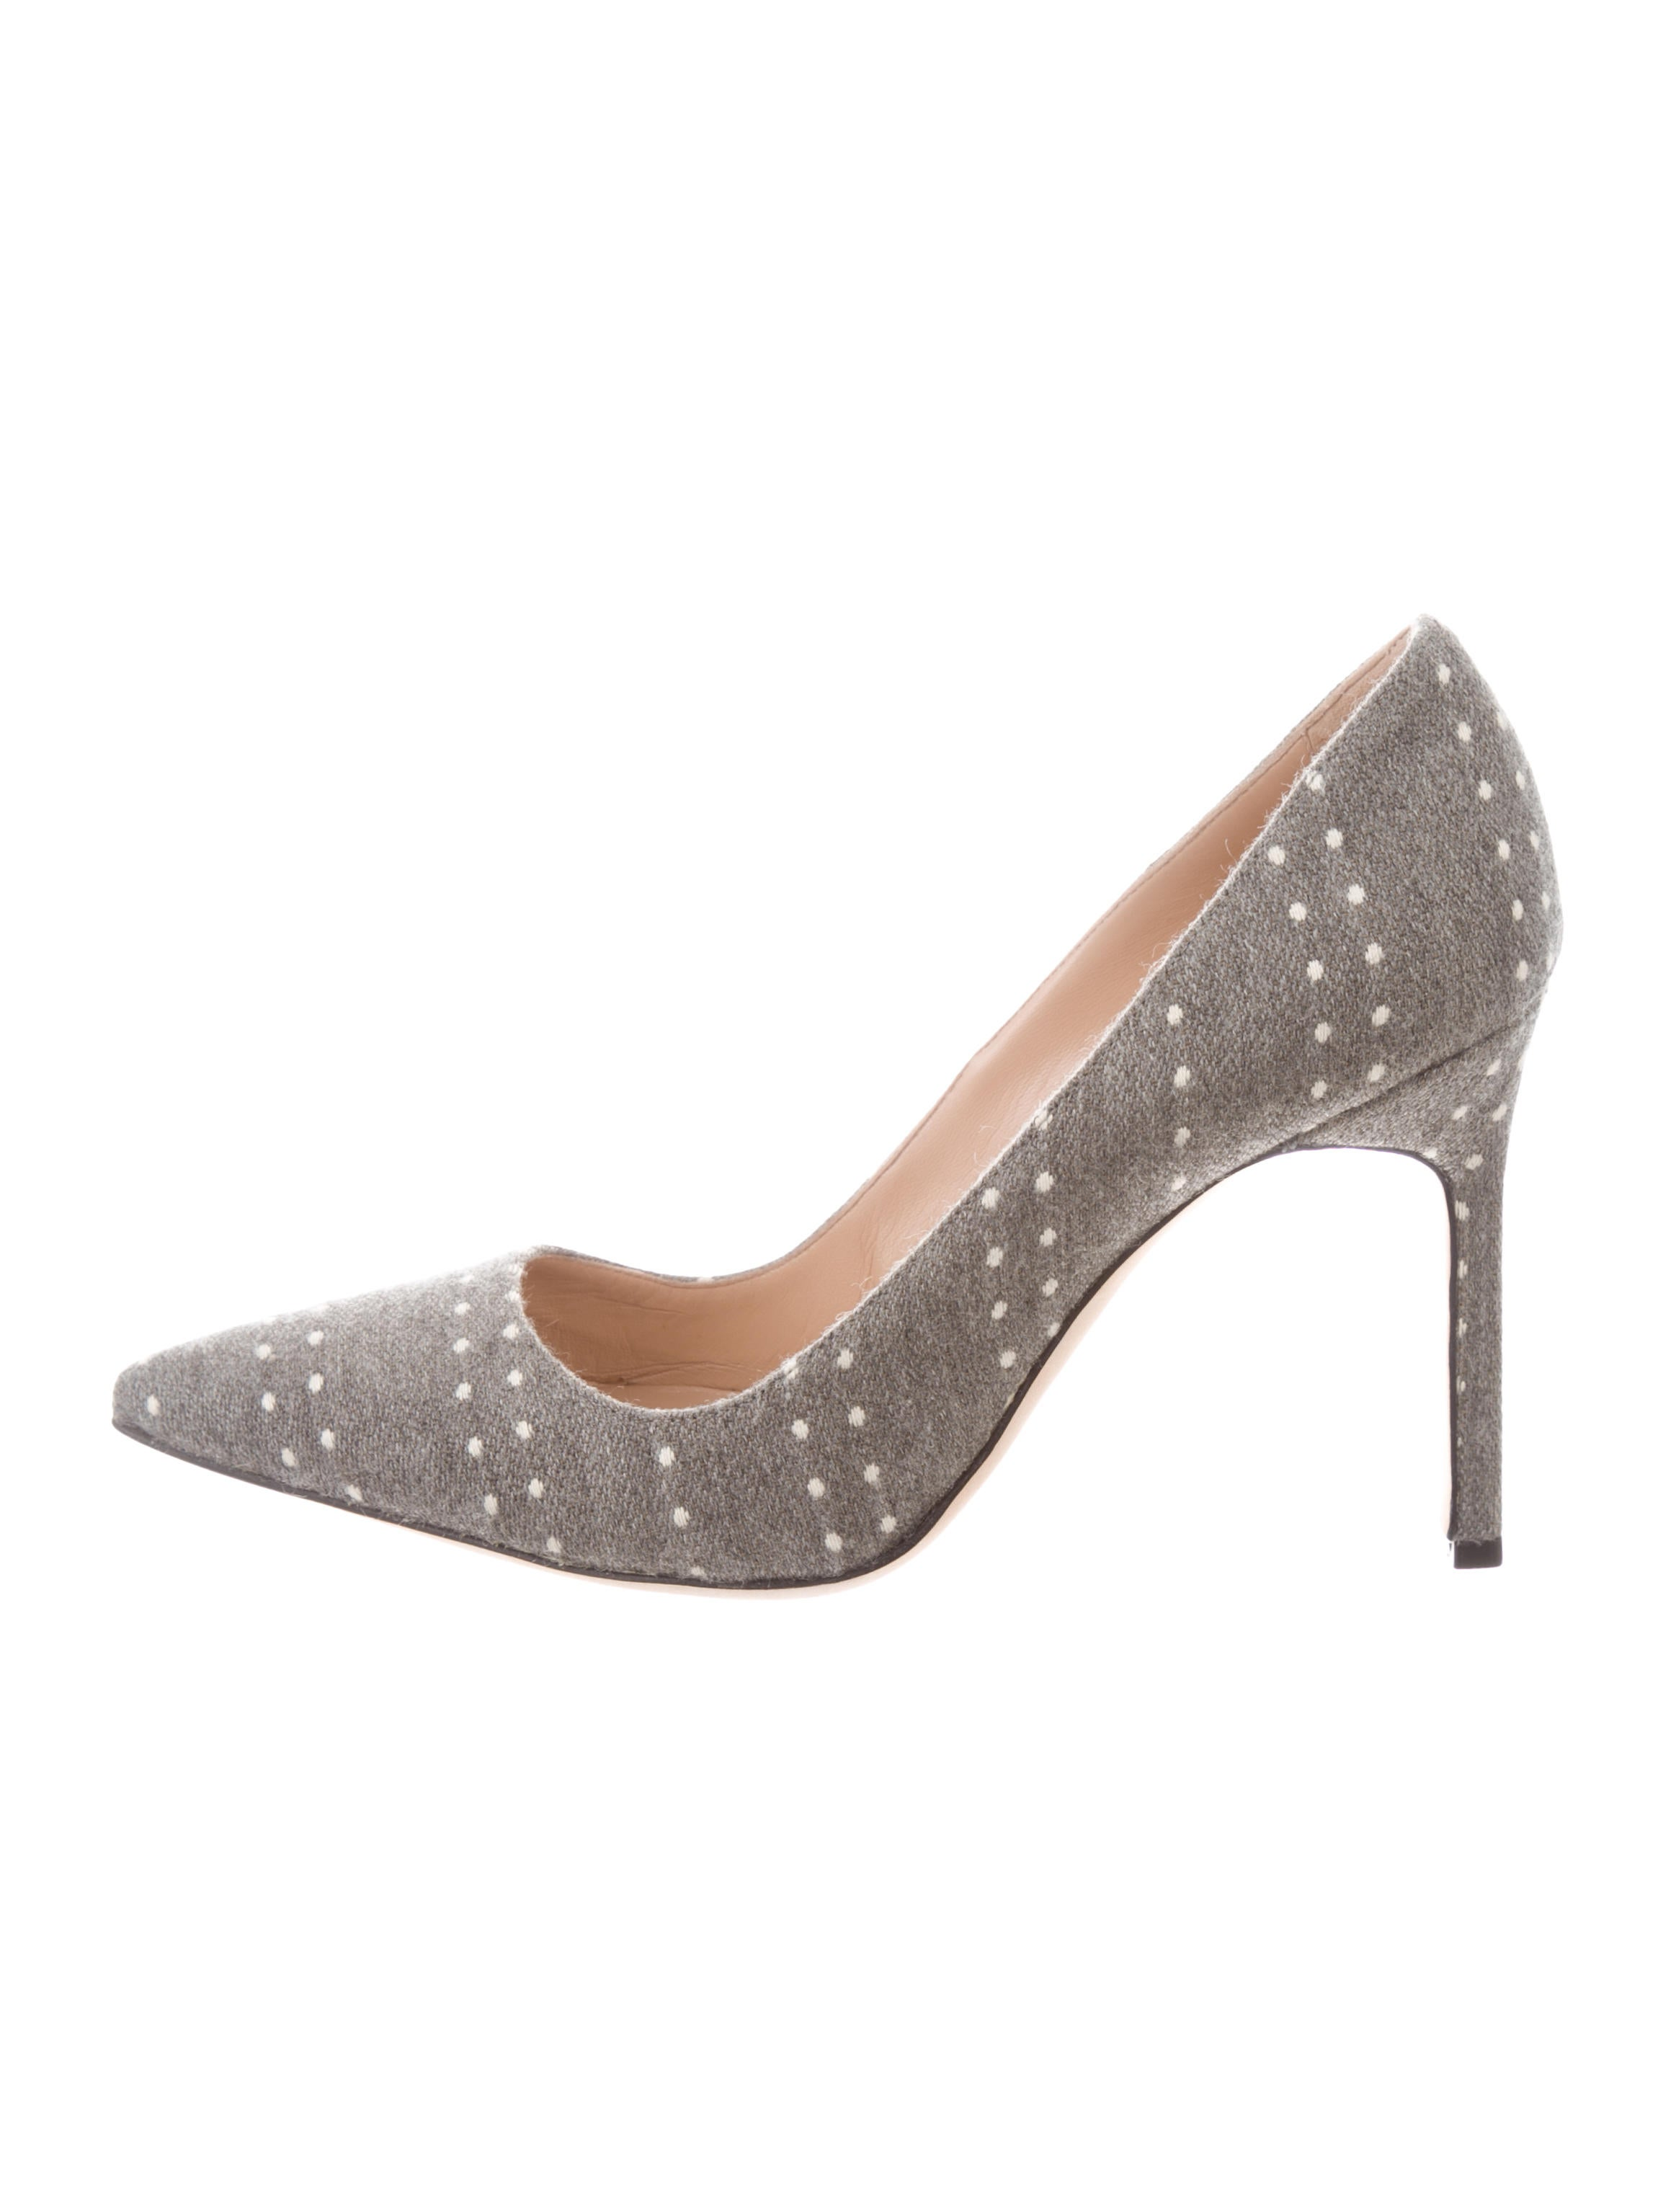 1d8488c8f4f6 Manolo Blahnik BB Polka Dot Flannel Pumps - Shoes - MOO97986 | The ...